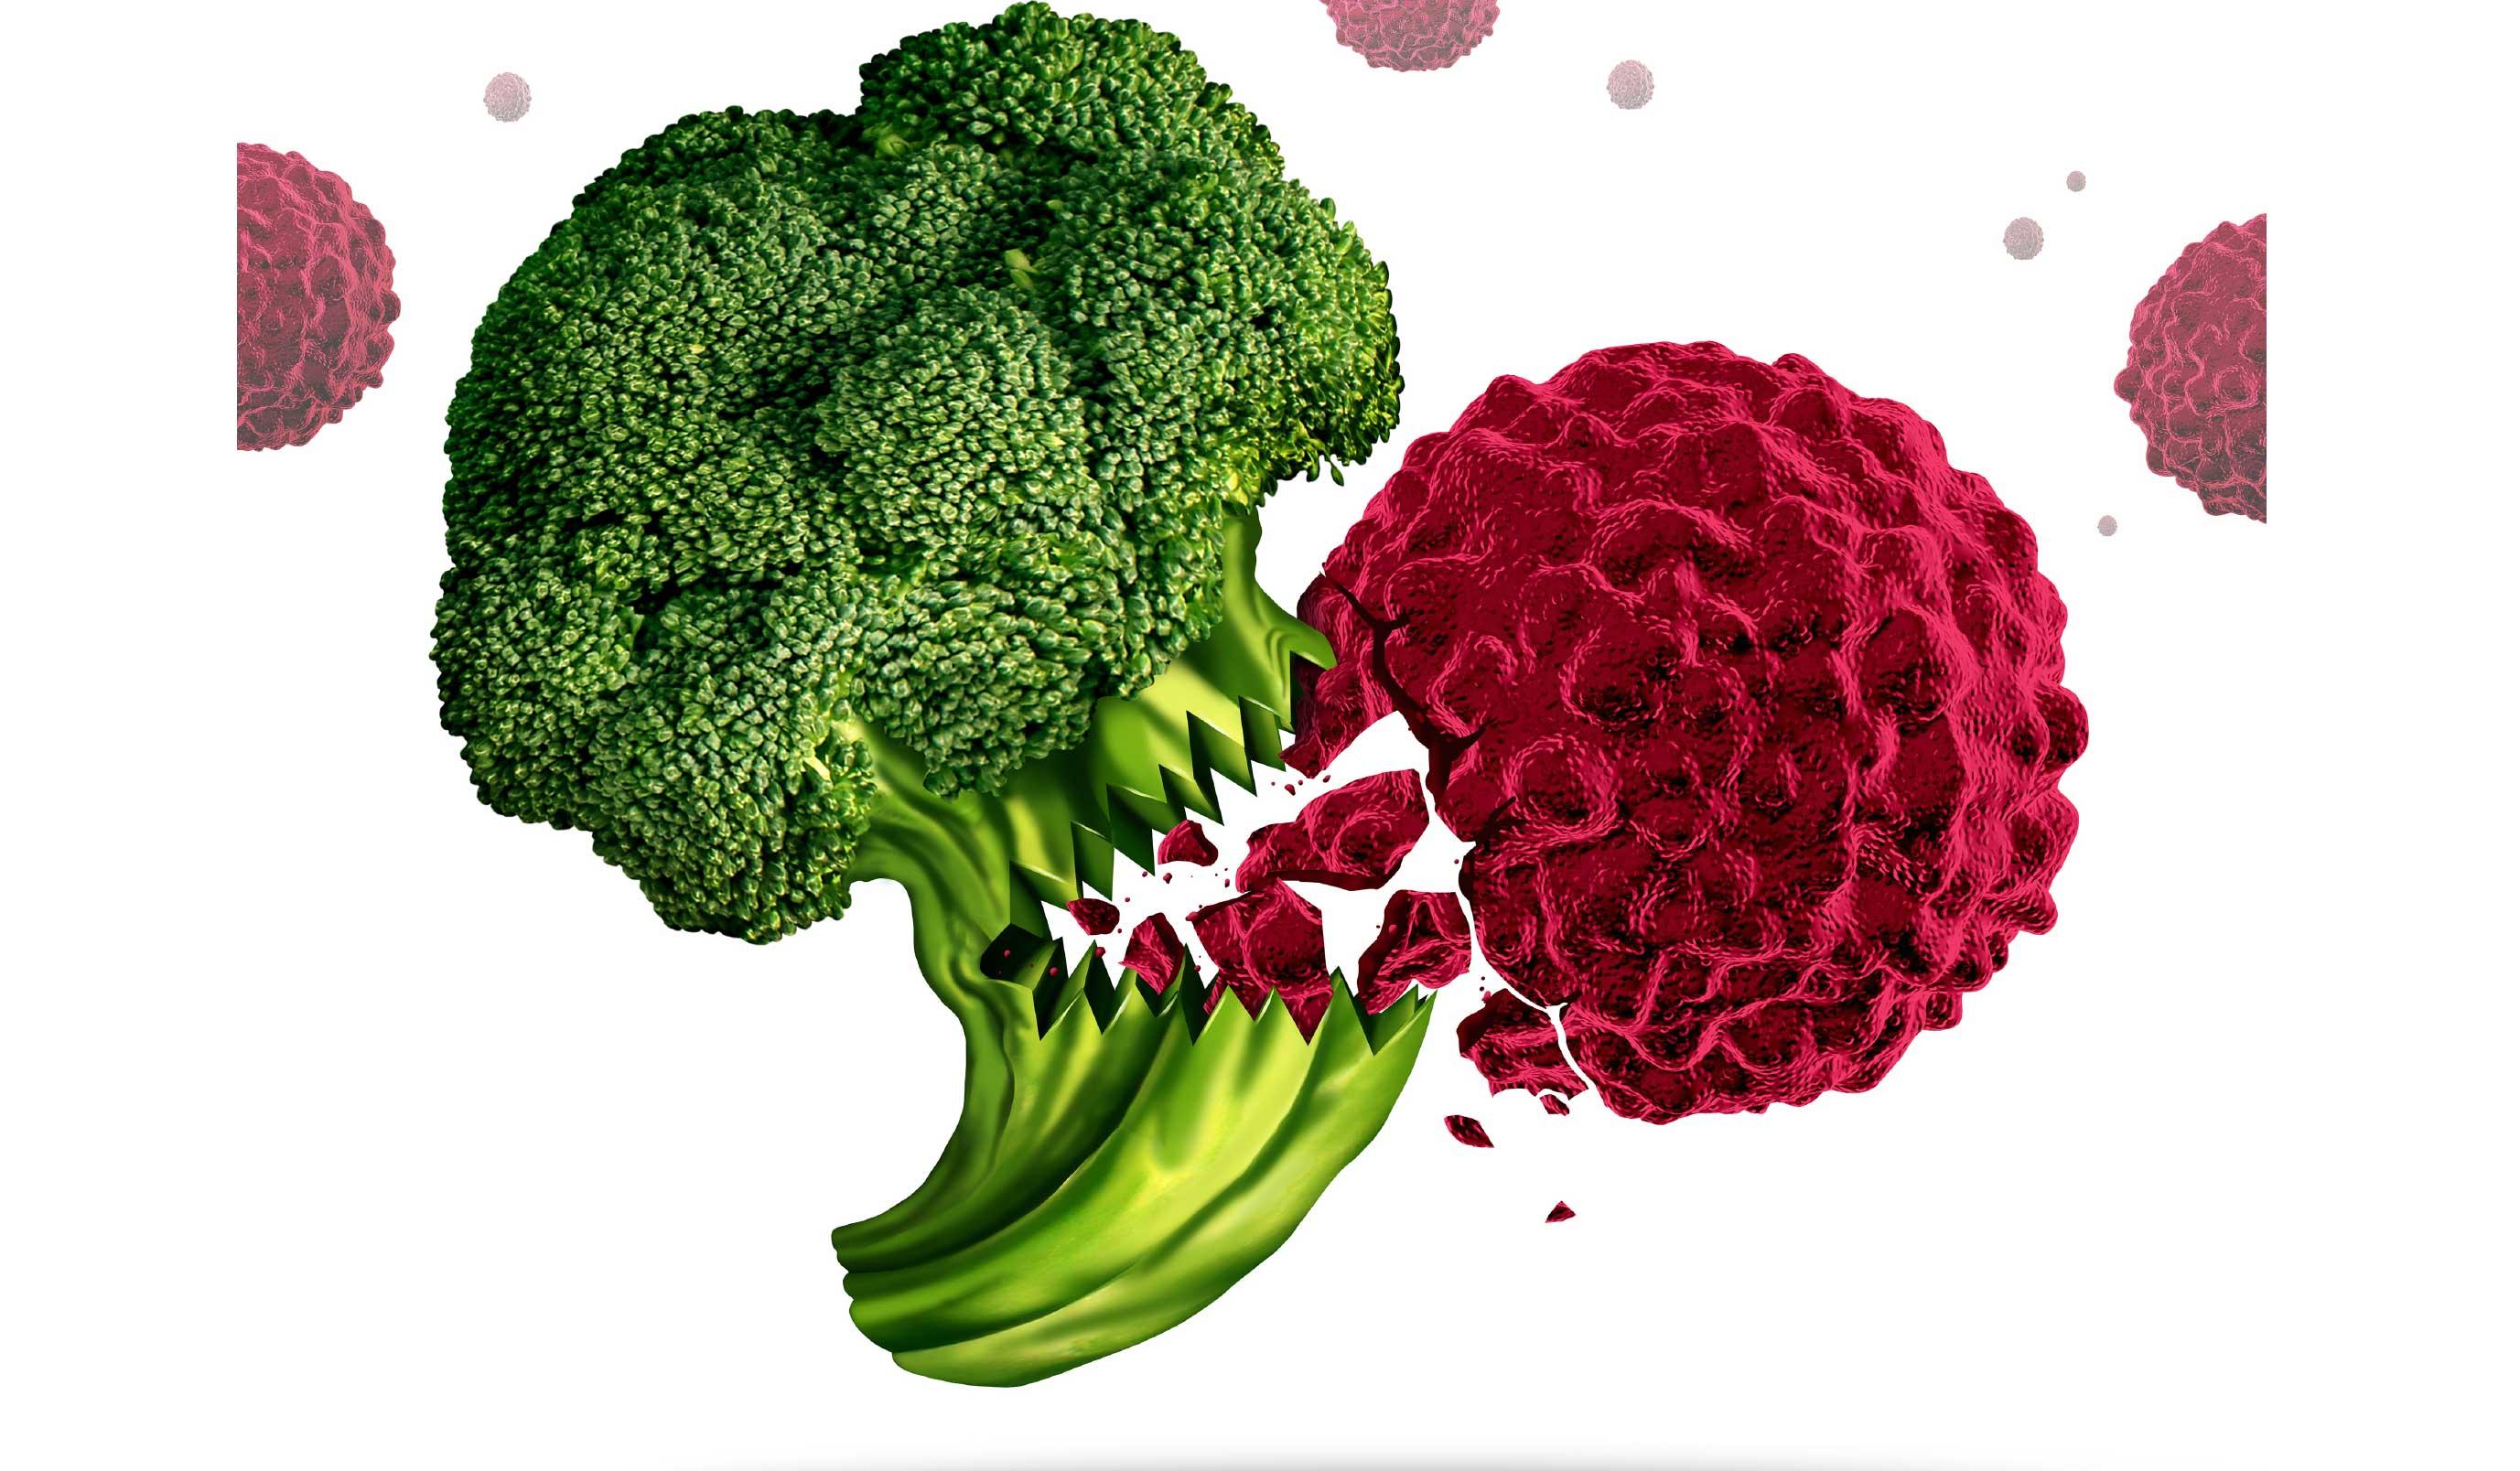 Alimentos que no deberíamos comer si queremos prevenir el cáncer